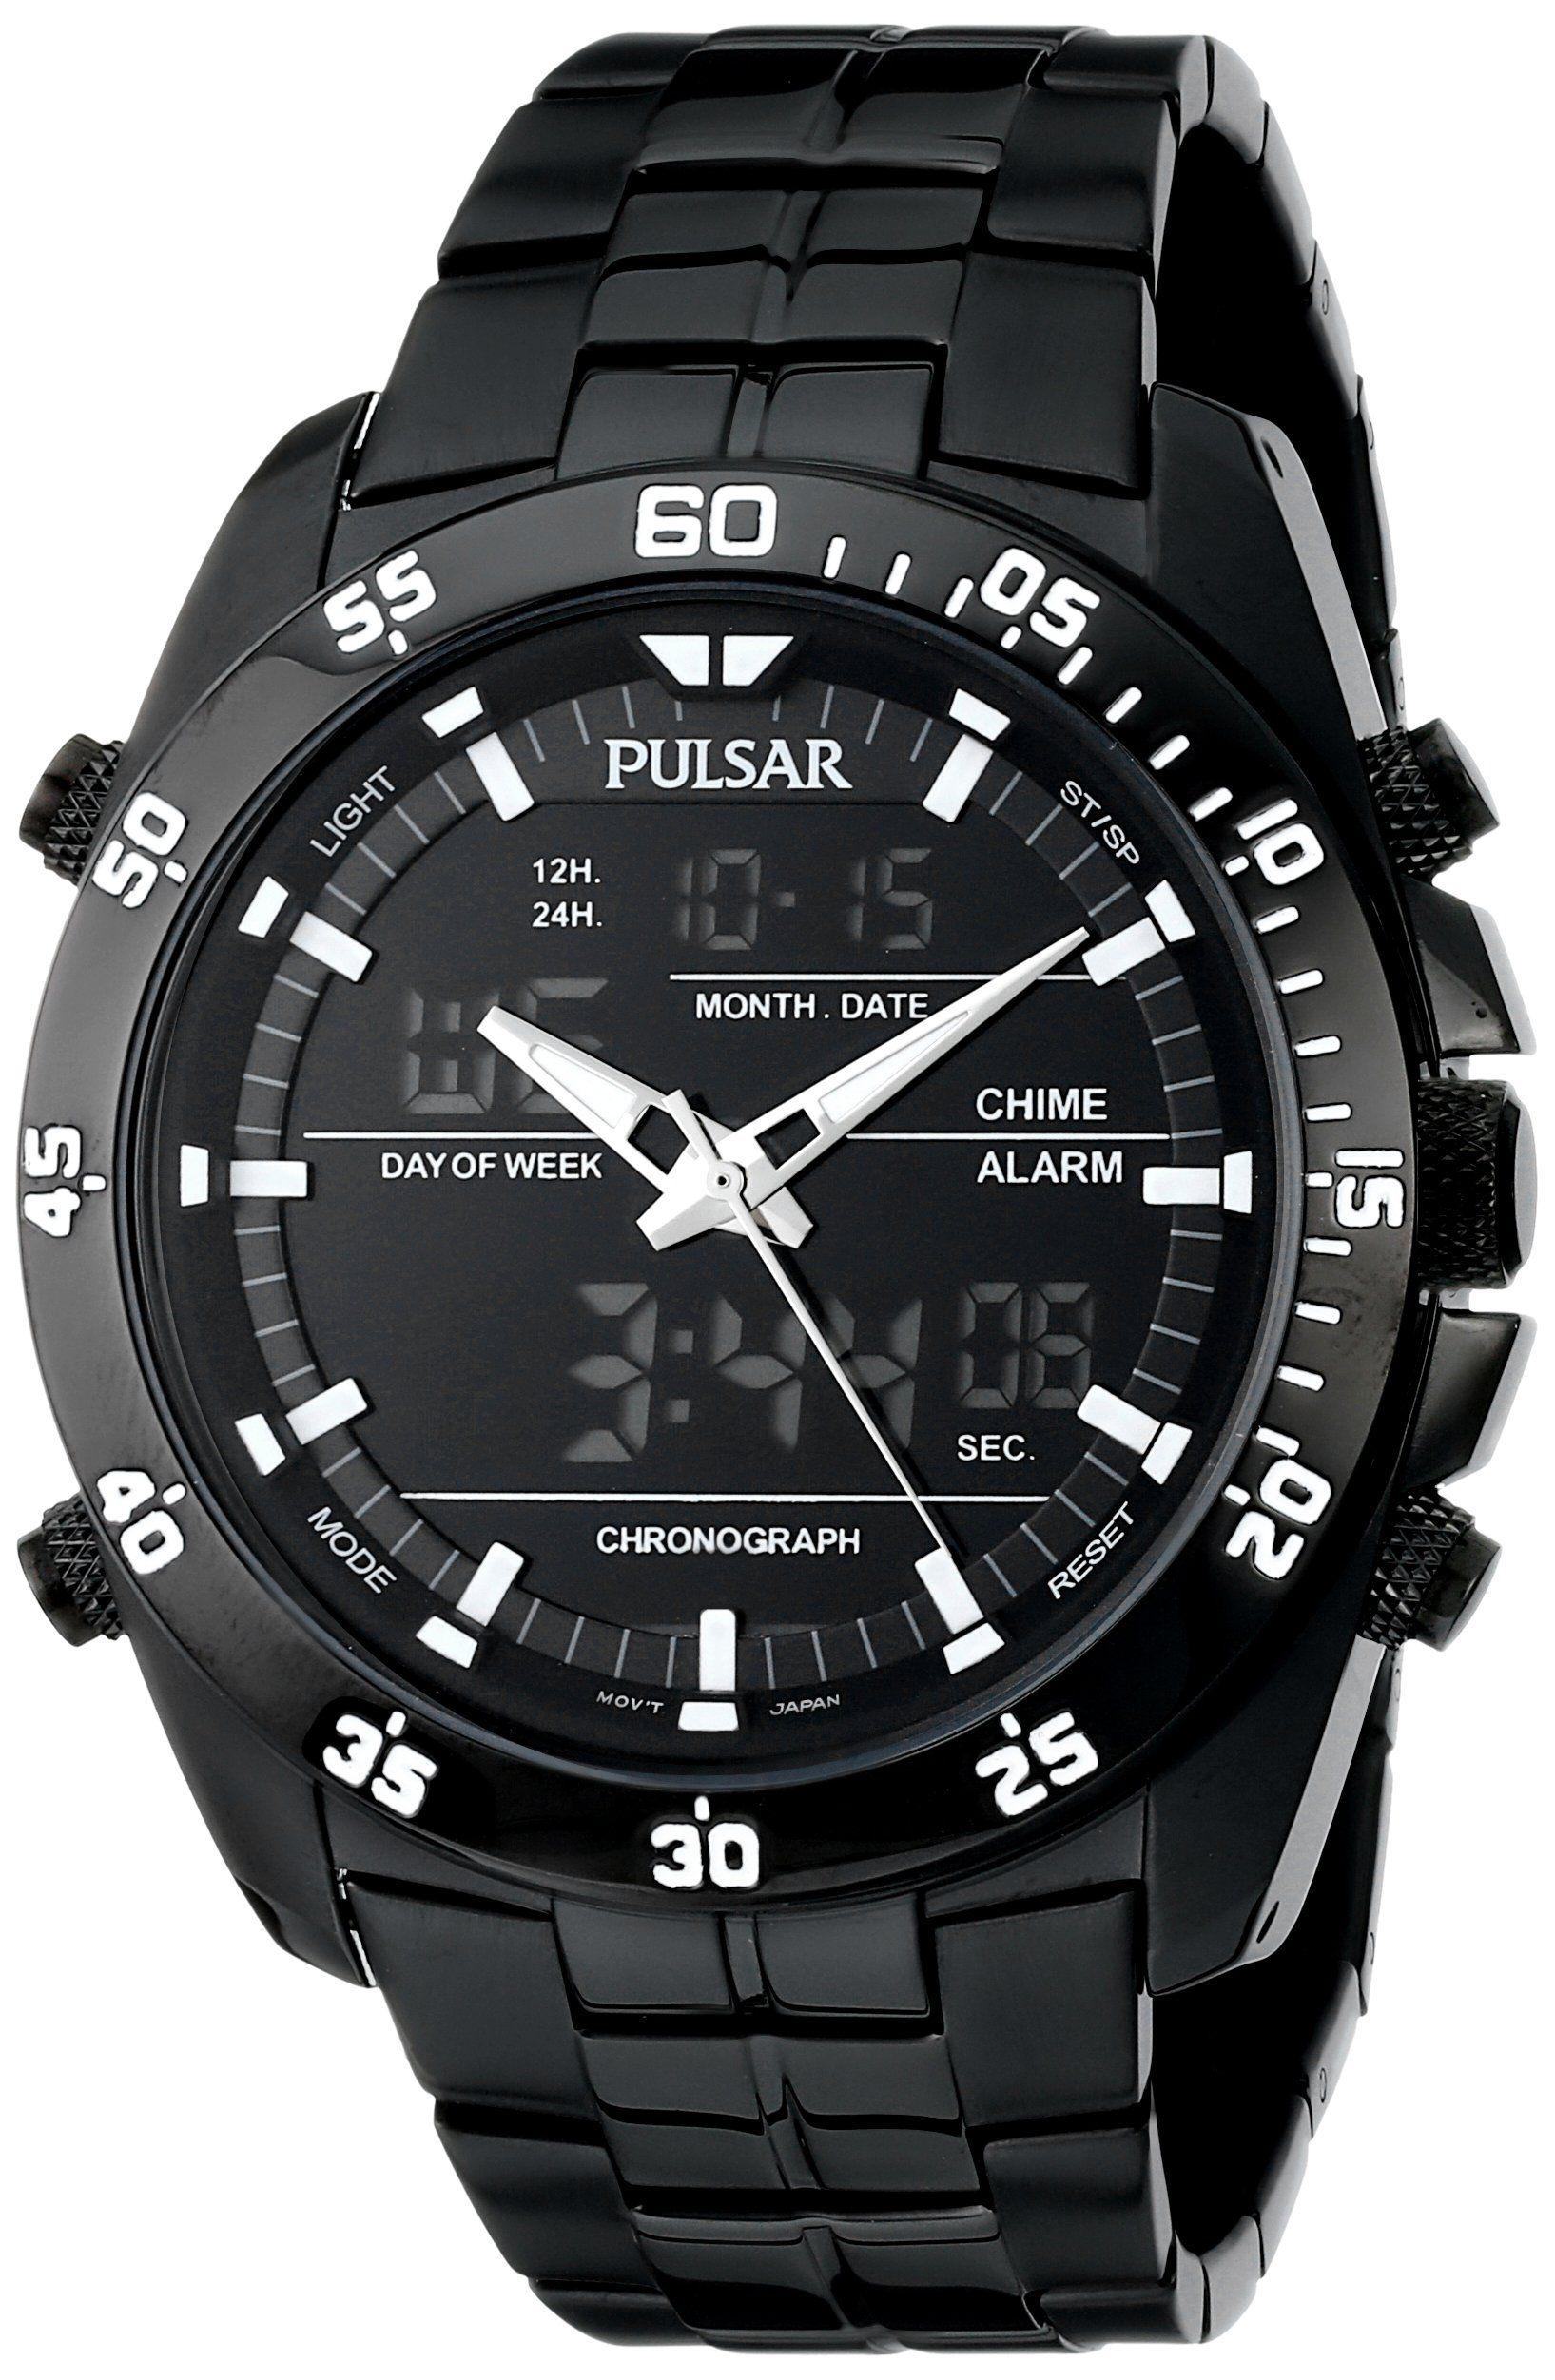 Reloj Pw6011 De Men's WatchRelojes Stainless Steel Pulso Pulsar JclFK1